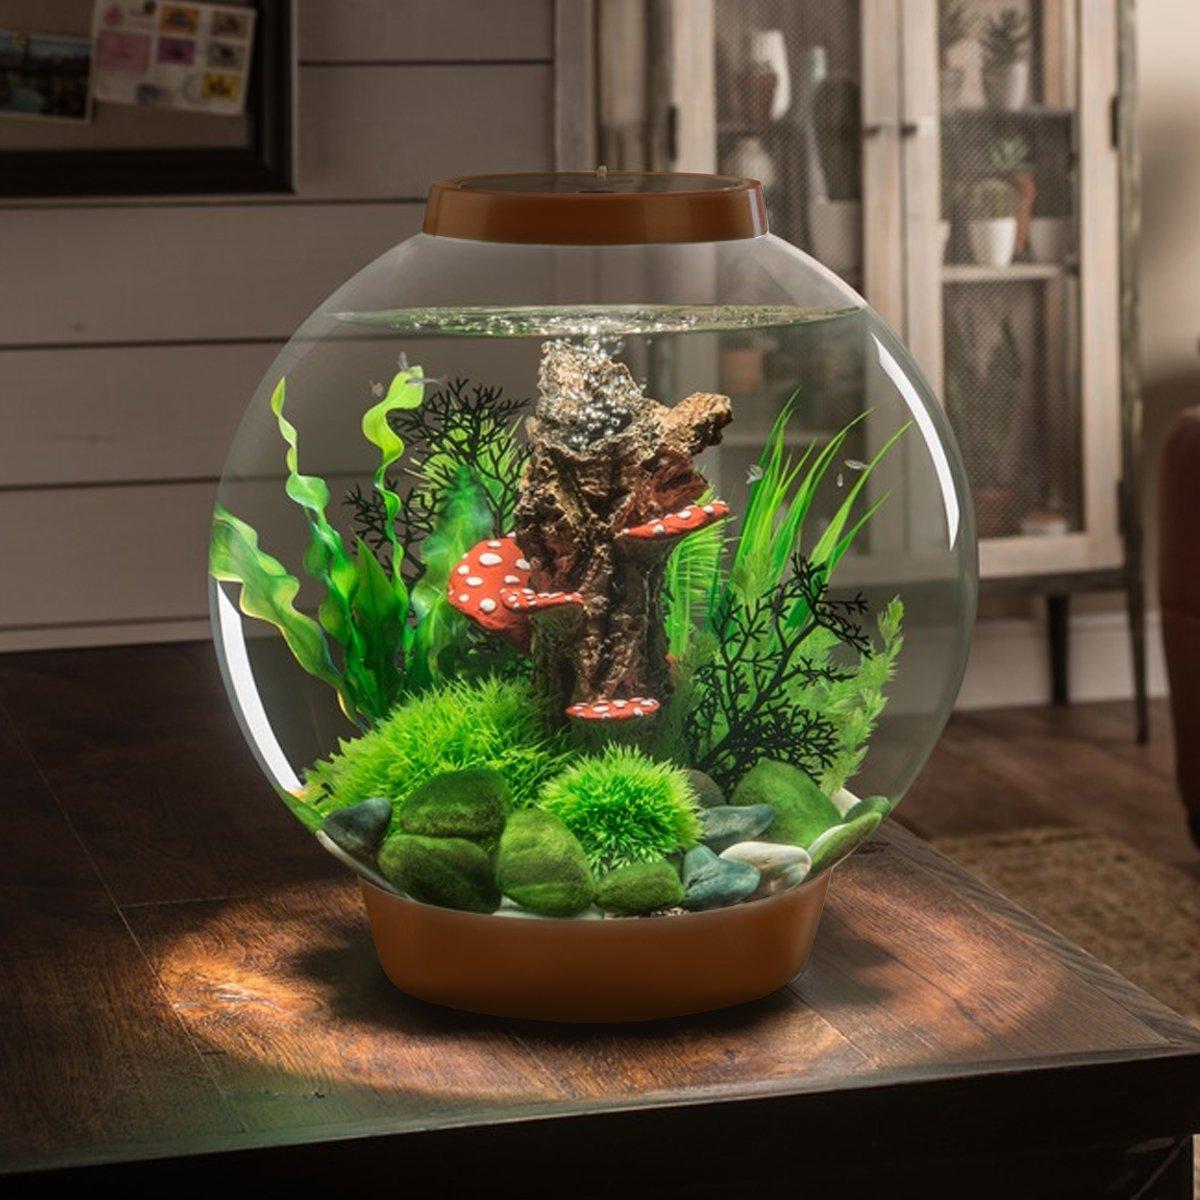 BiOrb Classic 30L Aquarium in Chocolate Brown with Standard LED Lighting